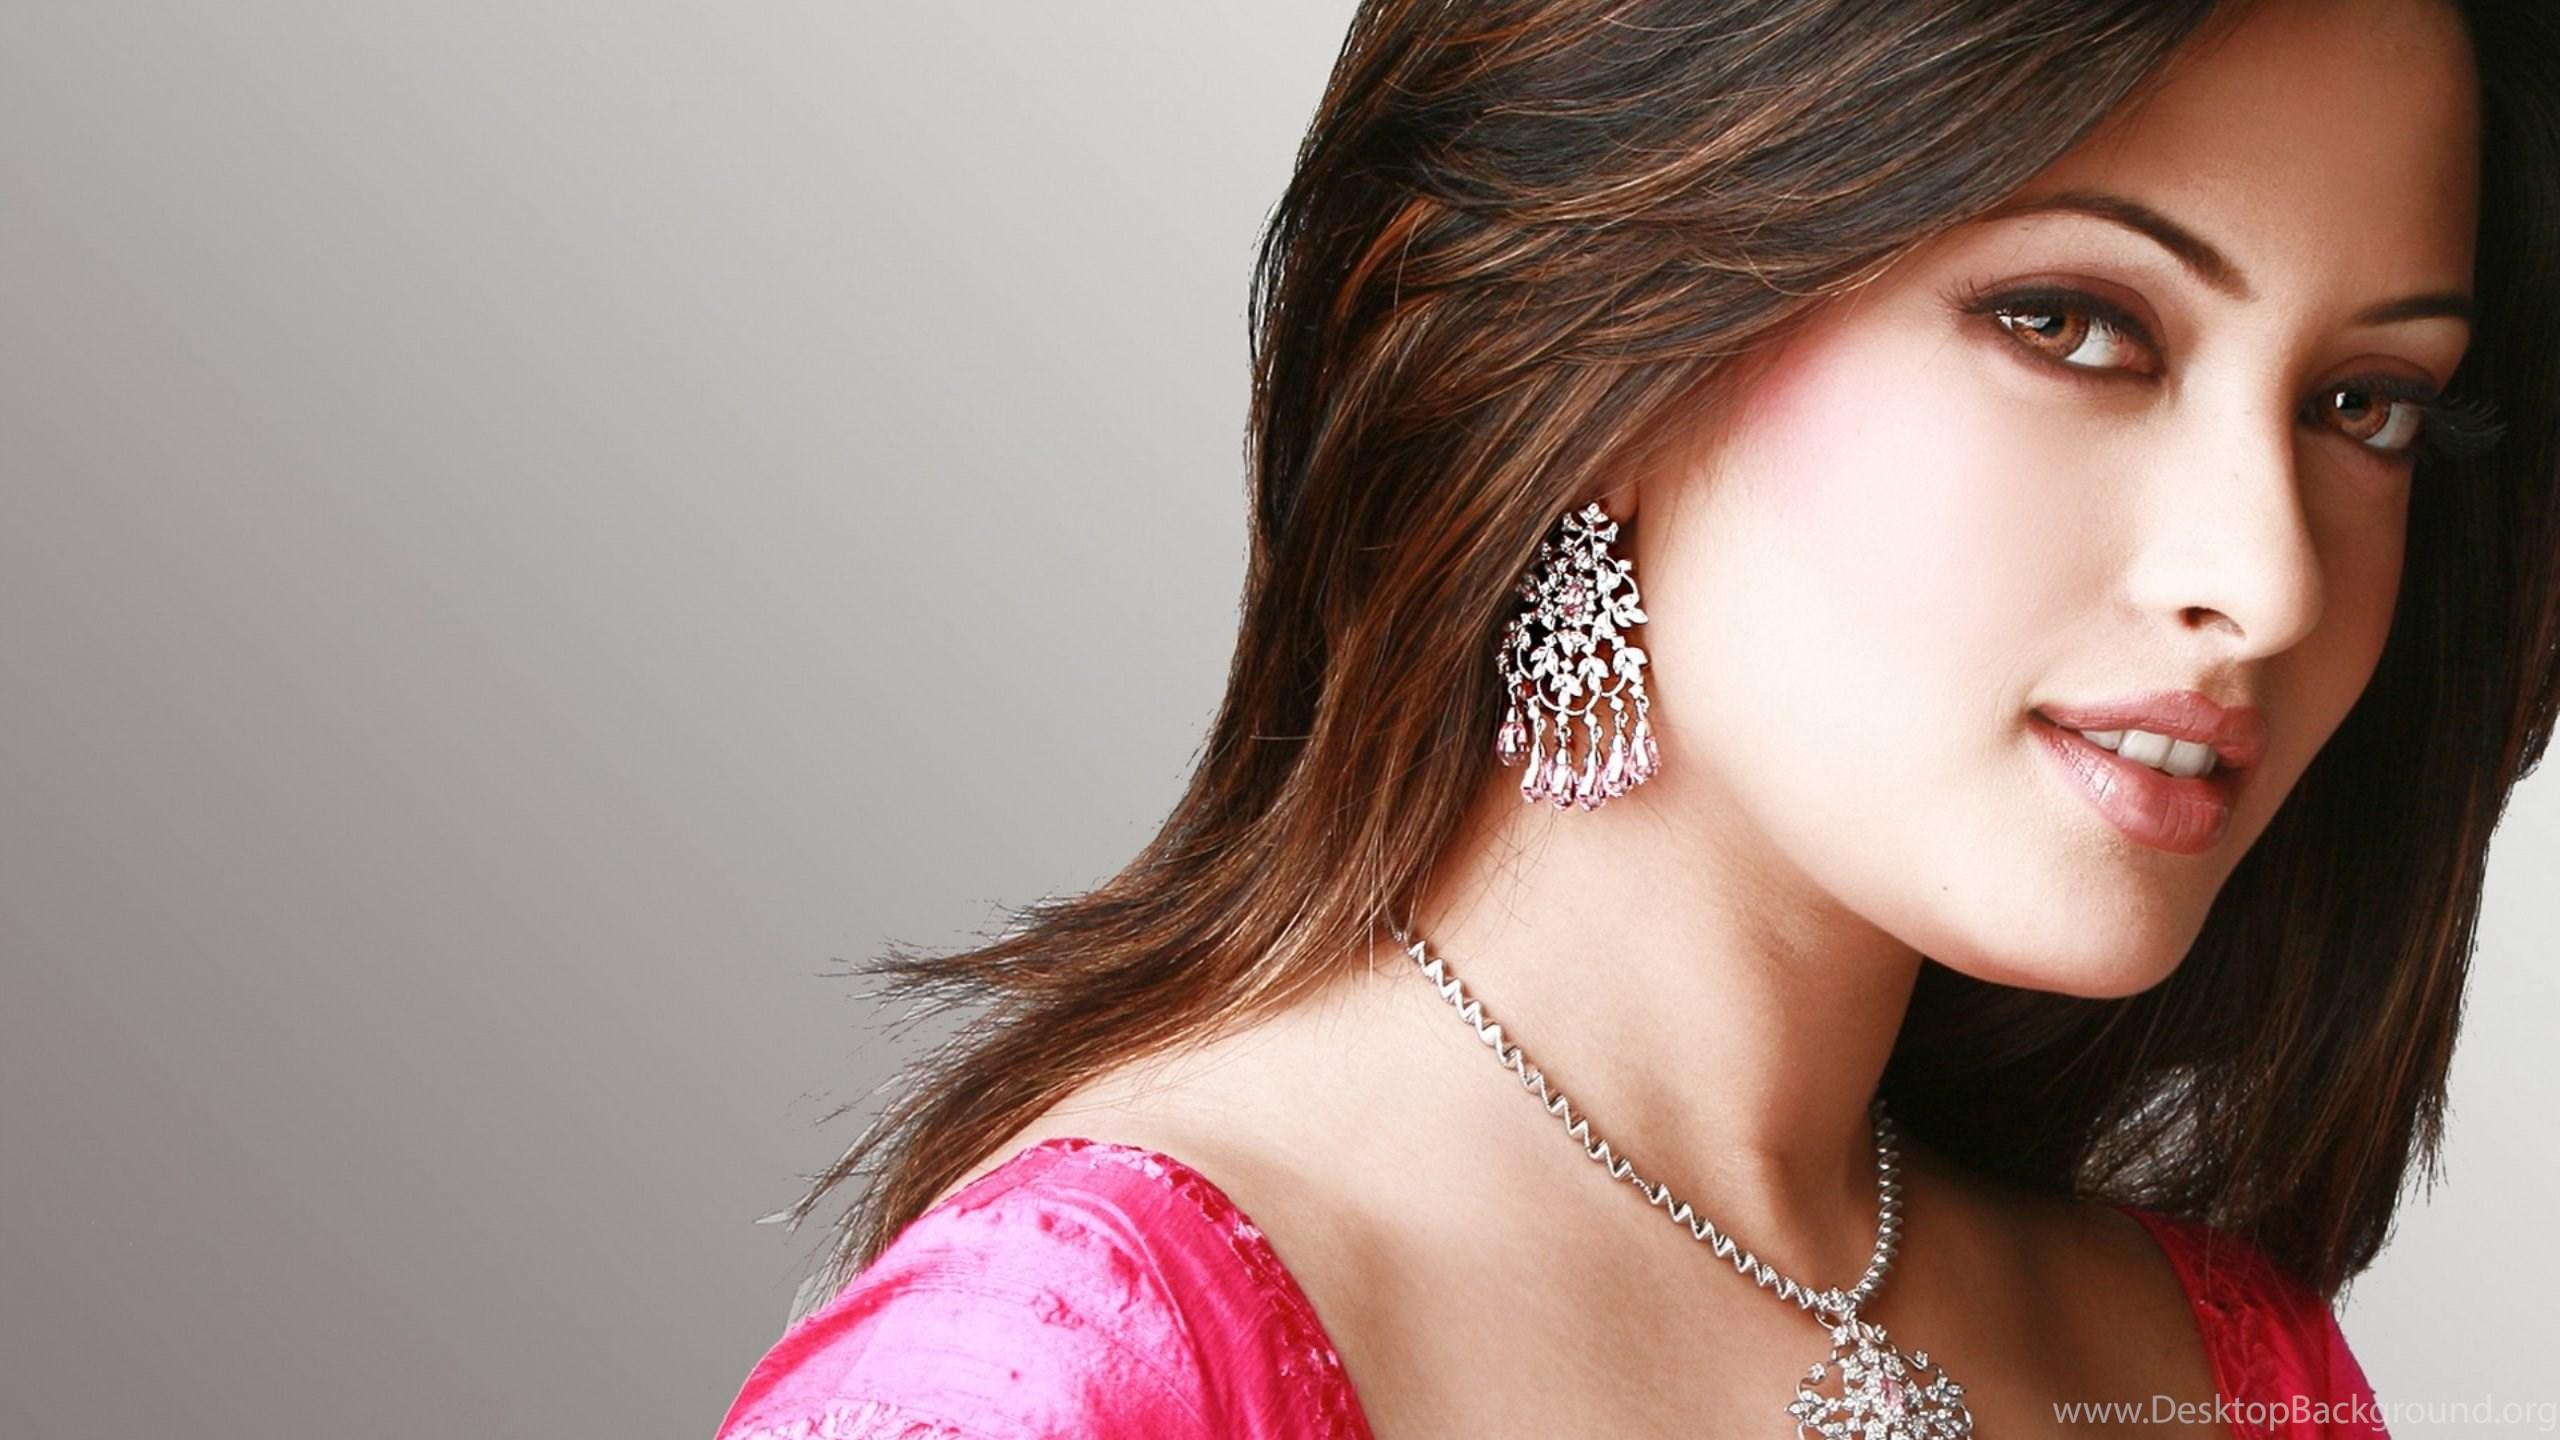 riya sen bollywood actress wallpapers for desktop & mobile desktop